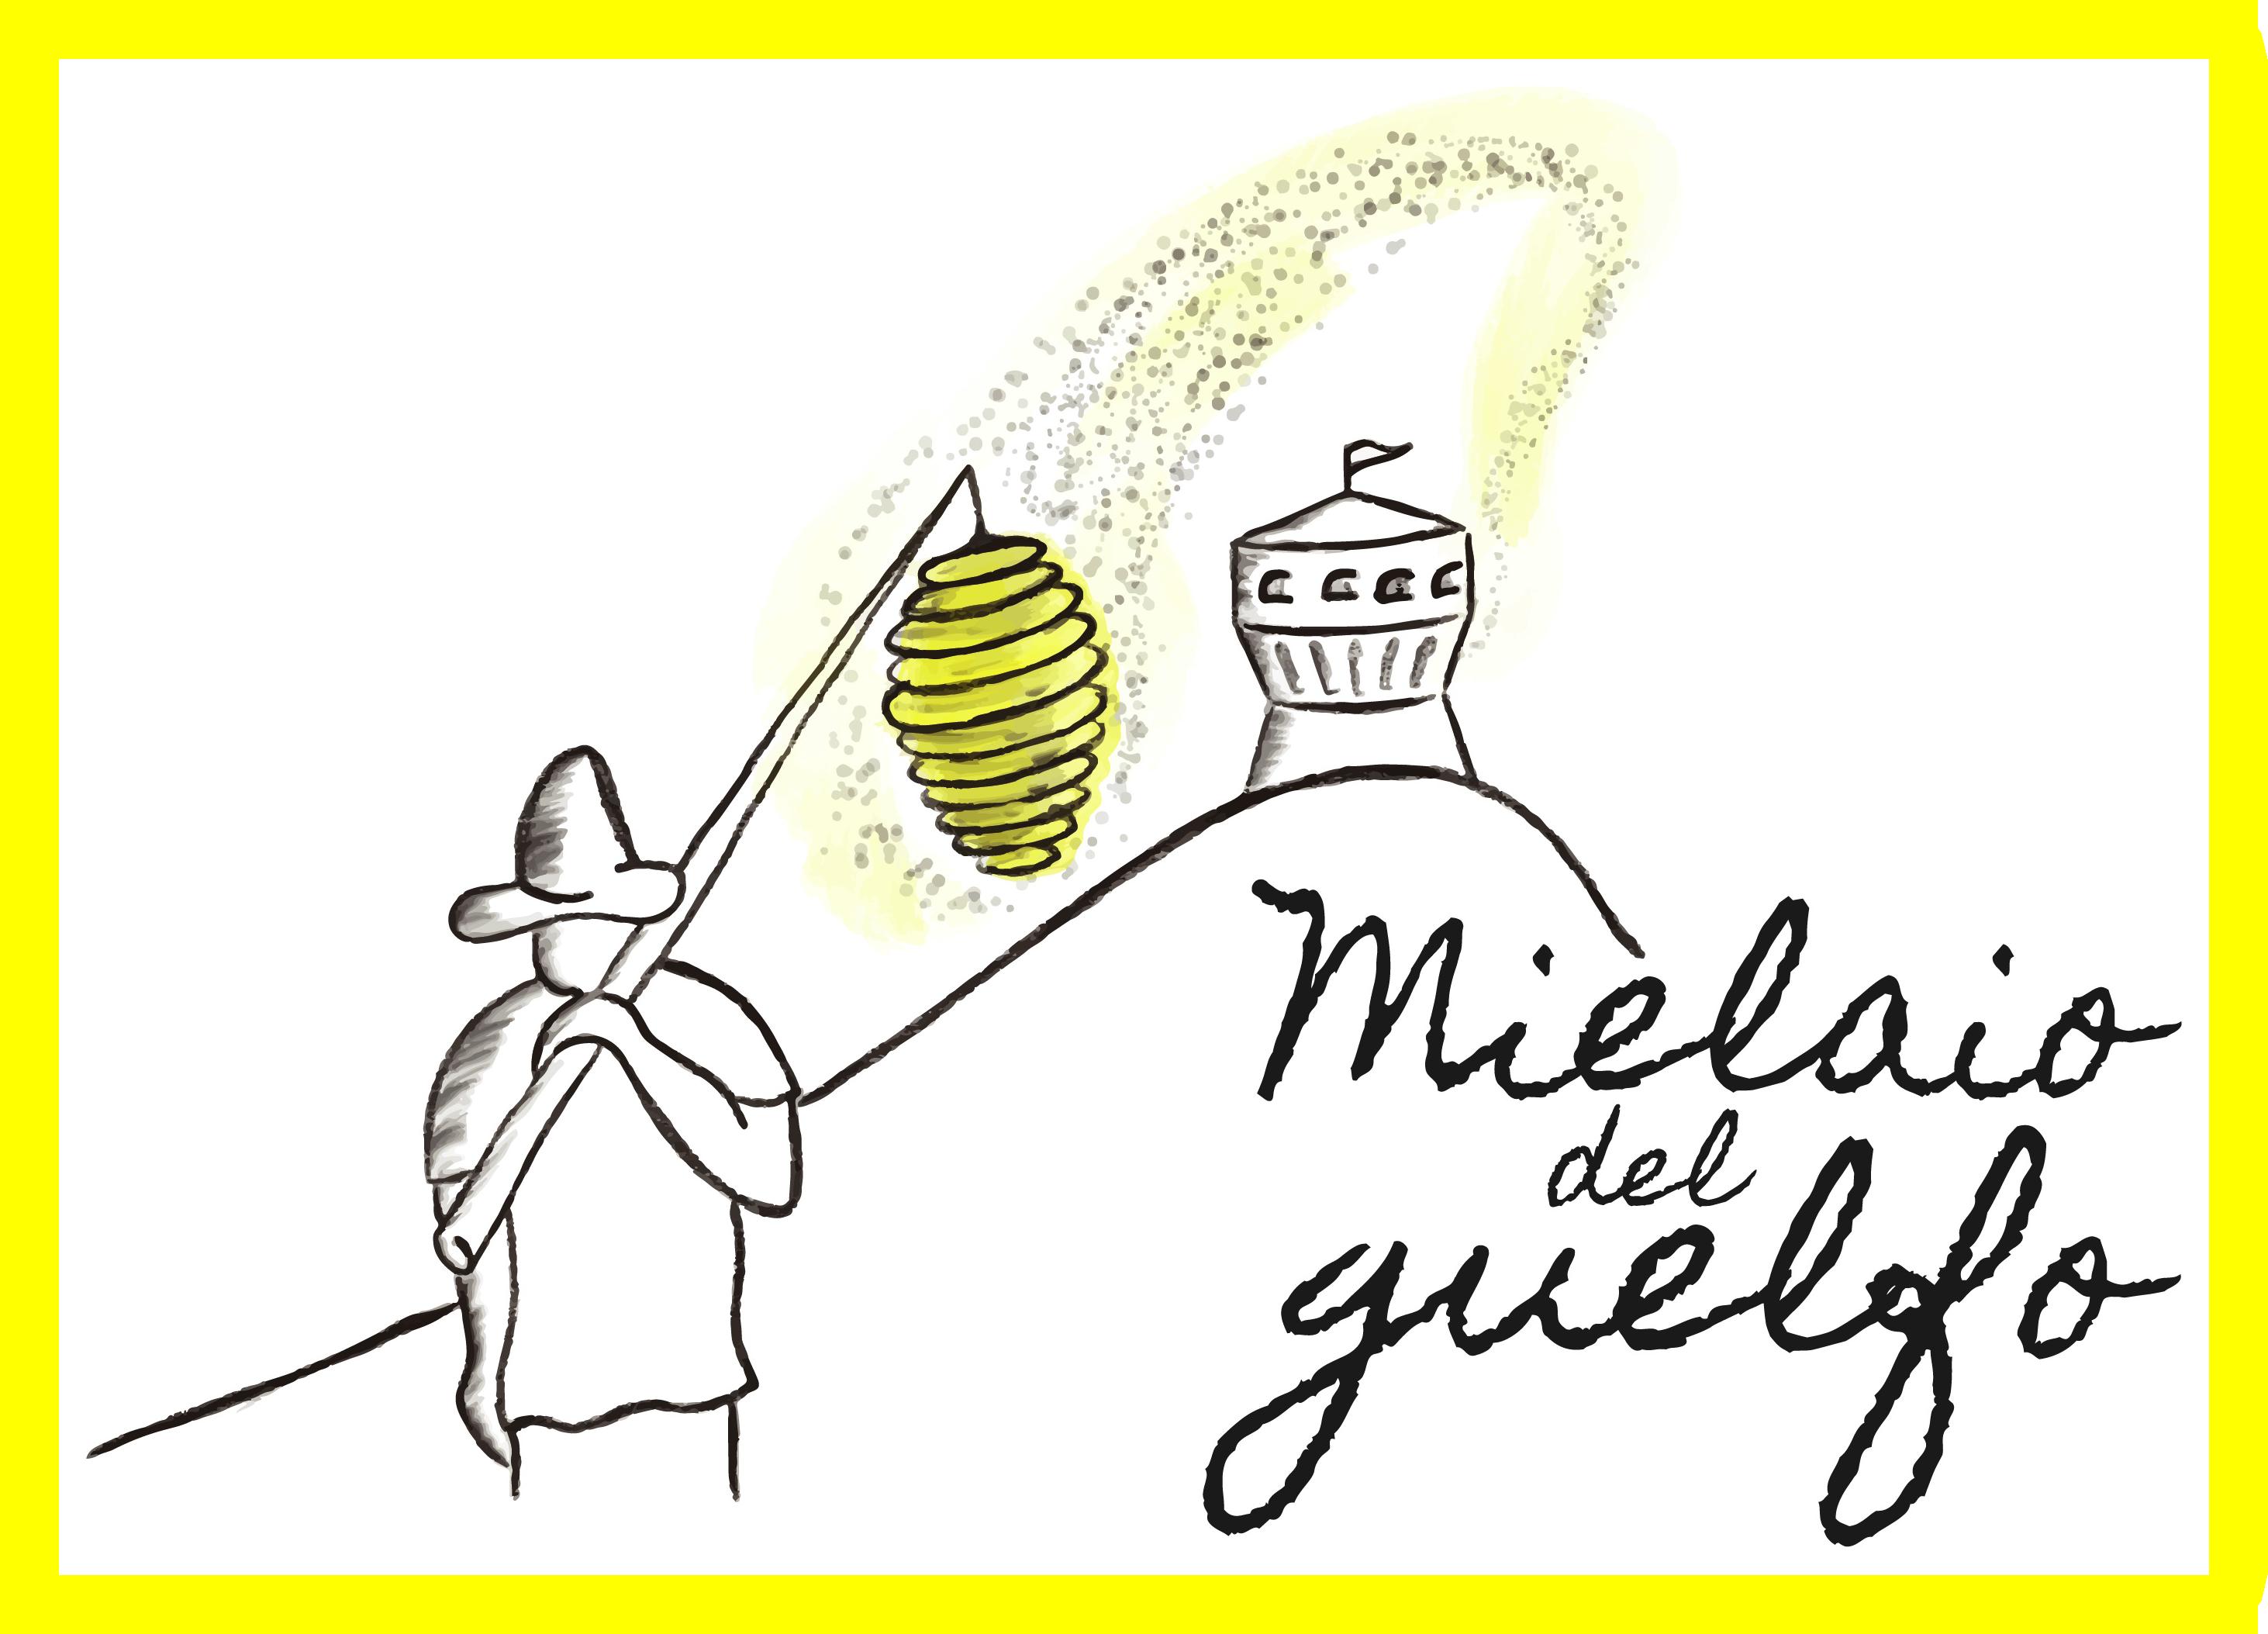 Mielaio del Guelfo